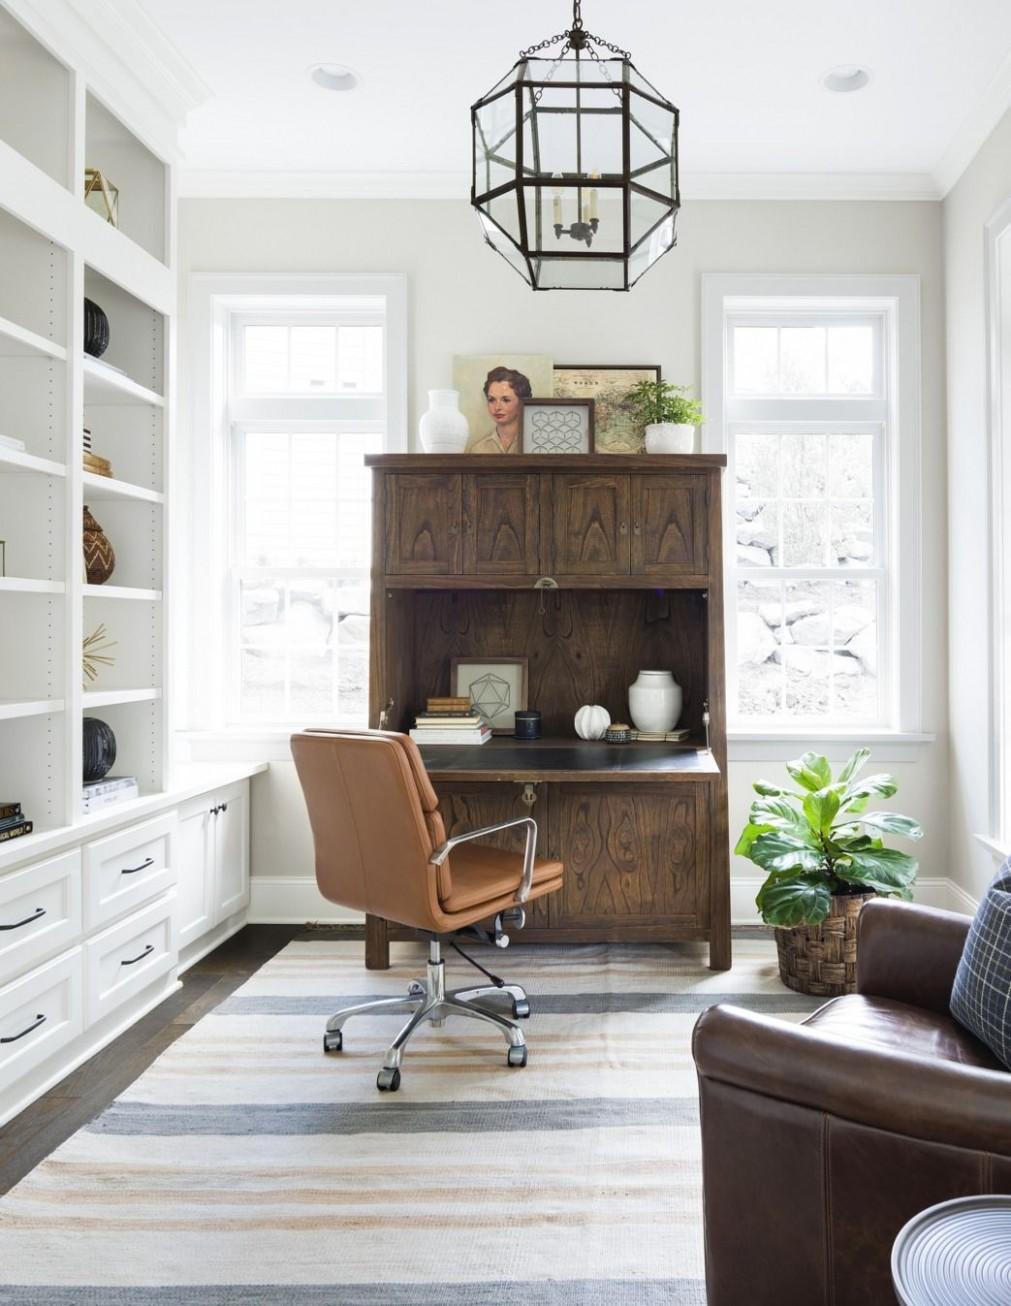 9 Sunroom Decorating Ideas - Best Designs for Sun Rooms - Sunroom Ideas For Office